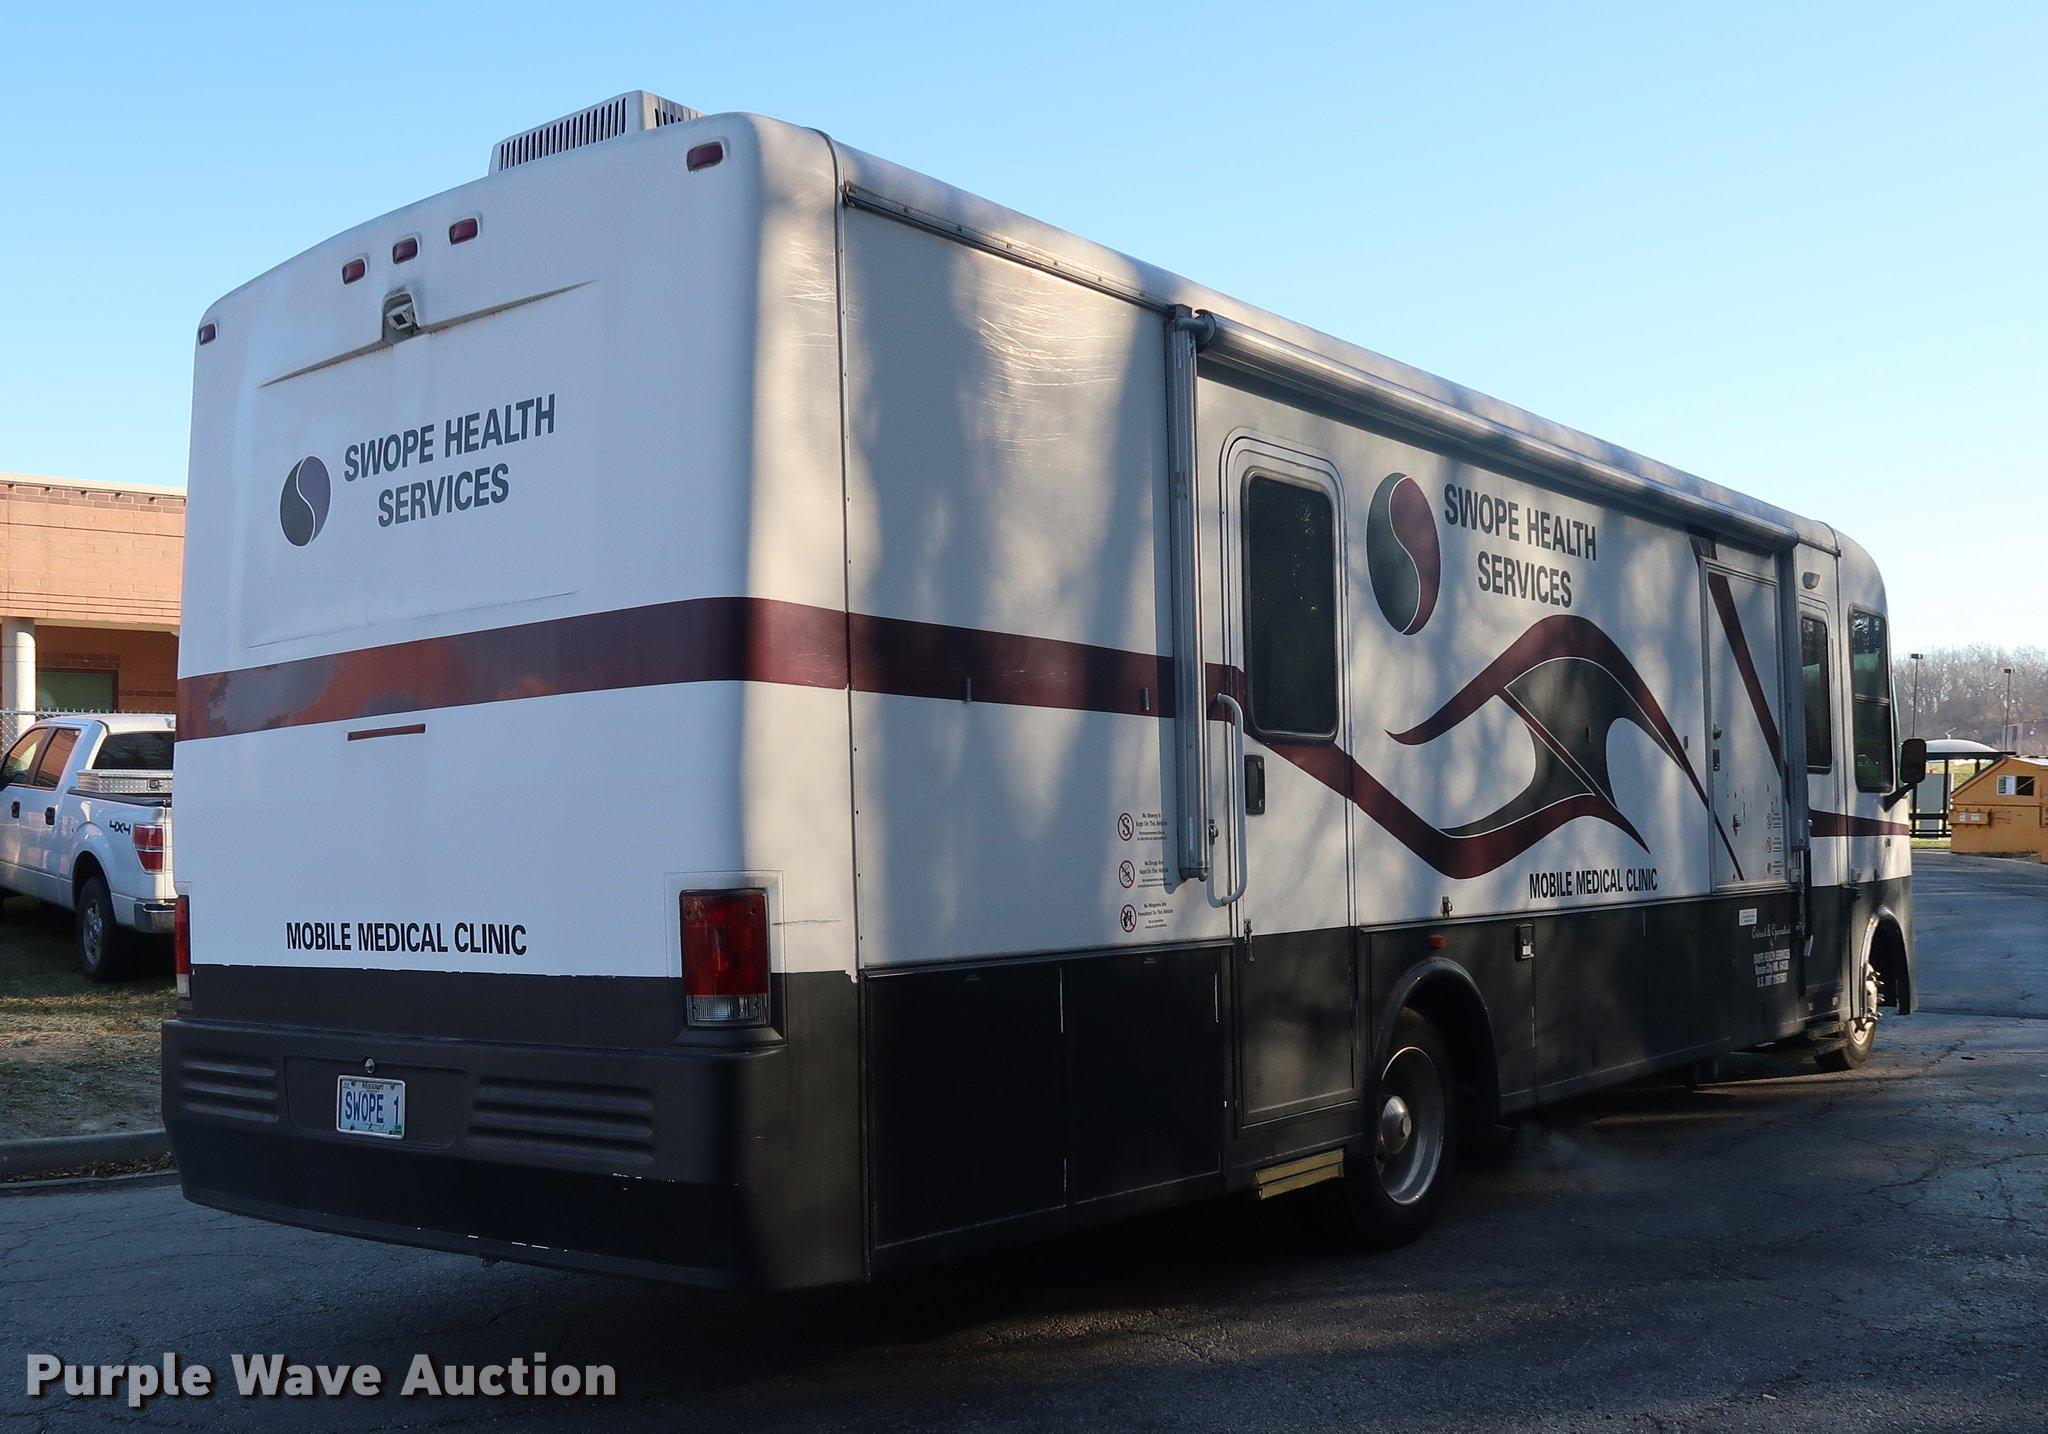 2004 Workhorse W22 mobile medical clinic RV | Item DA8524 |